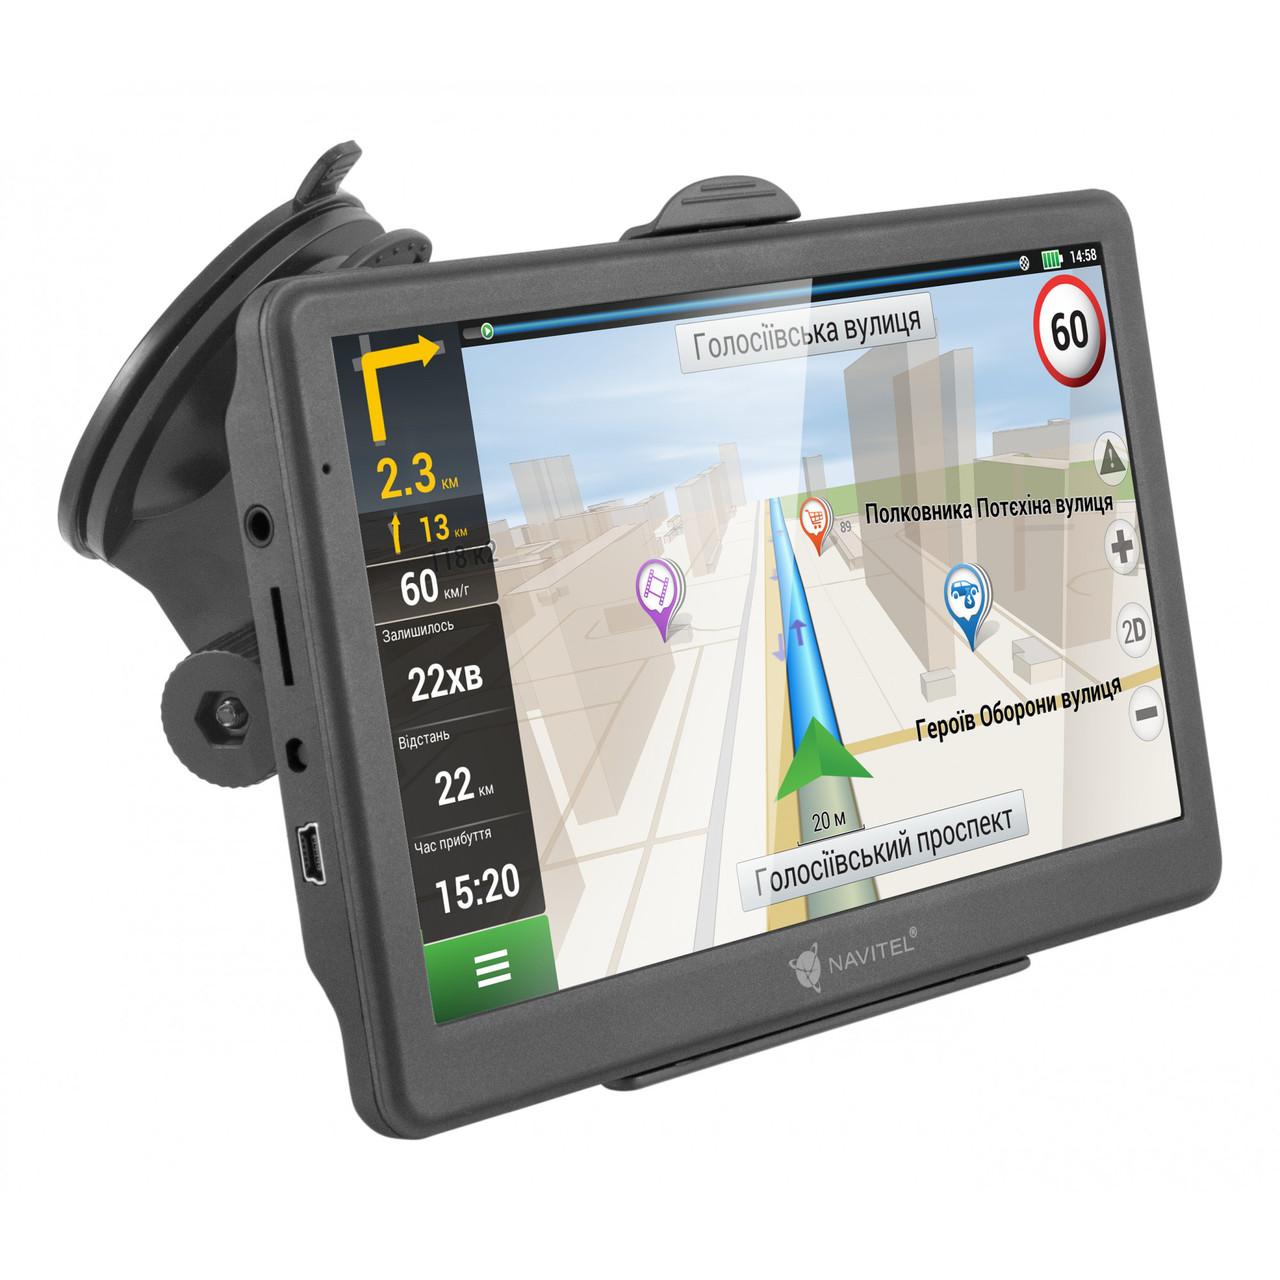 GPS-навигатор Navitel E700, фото 1